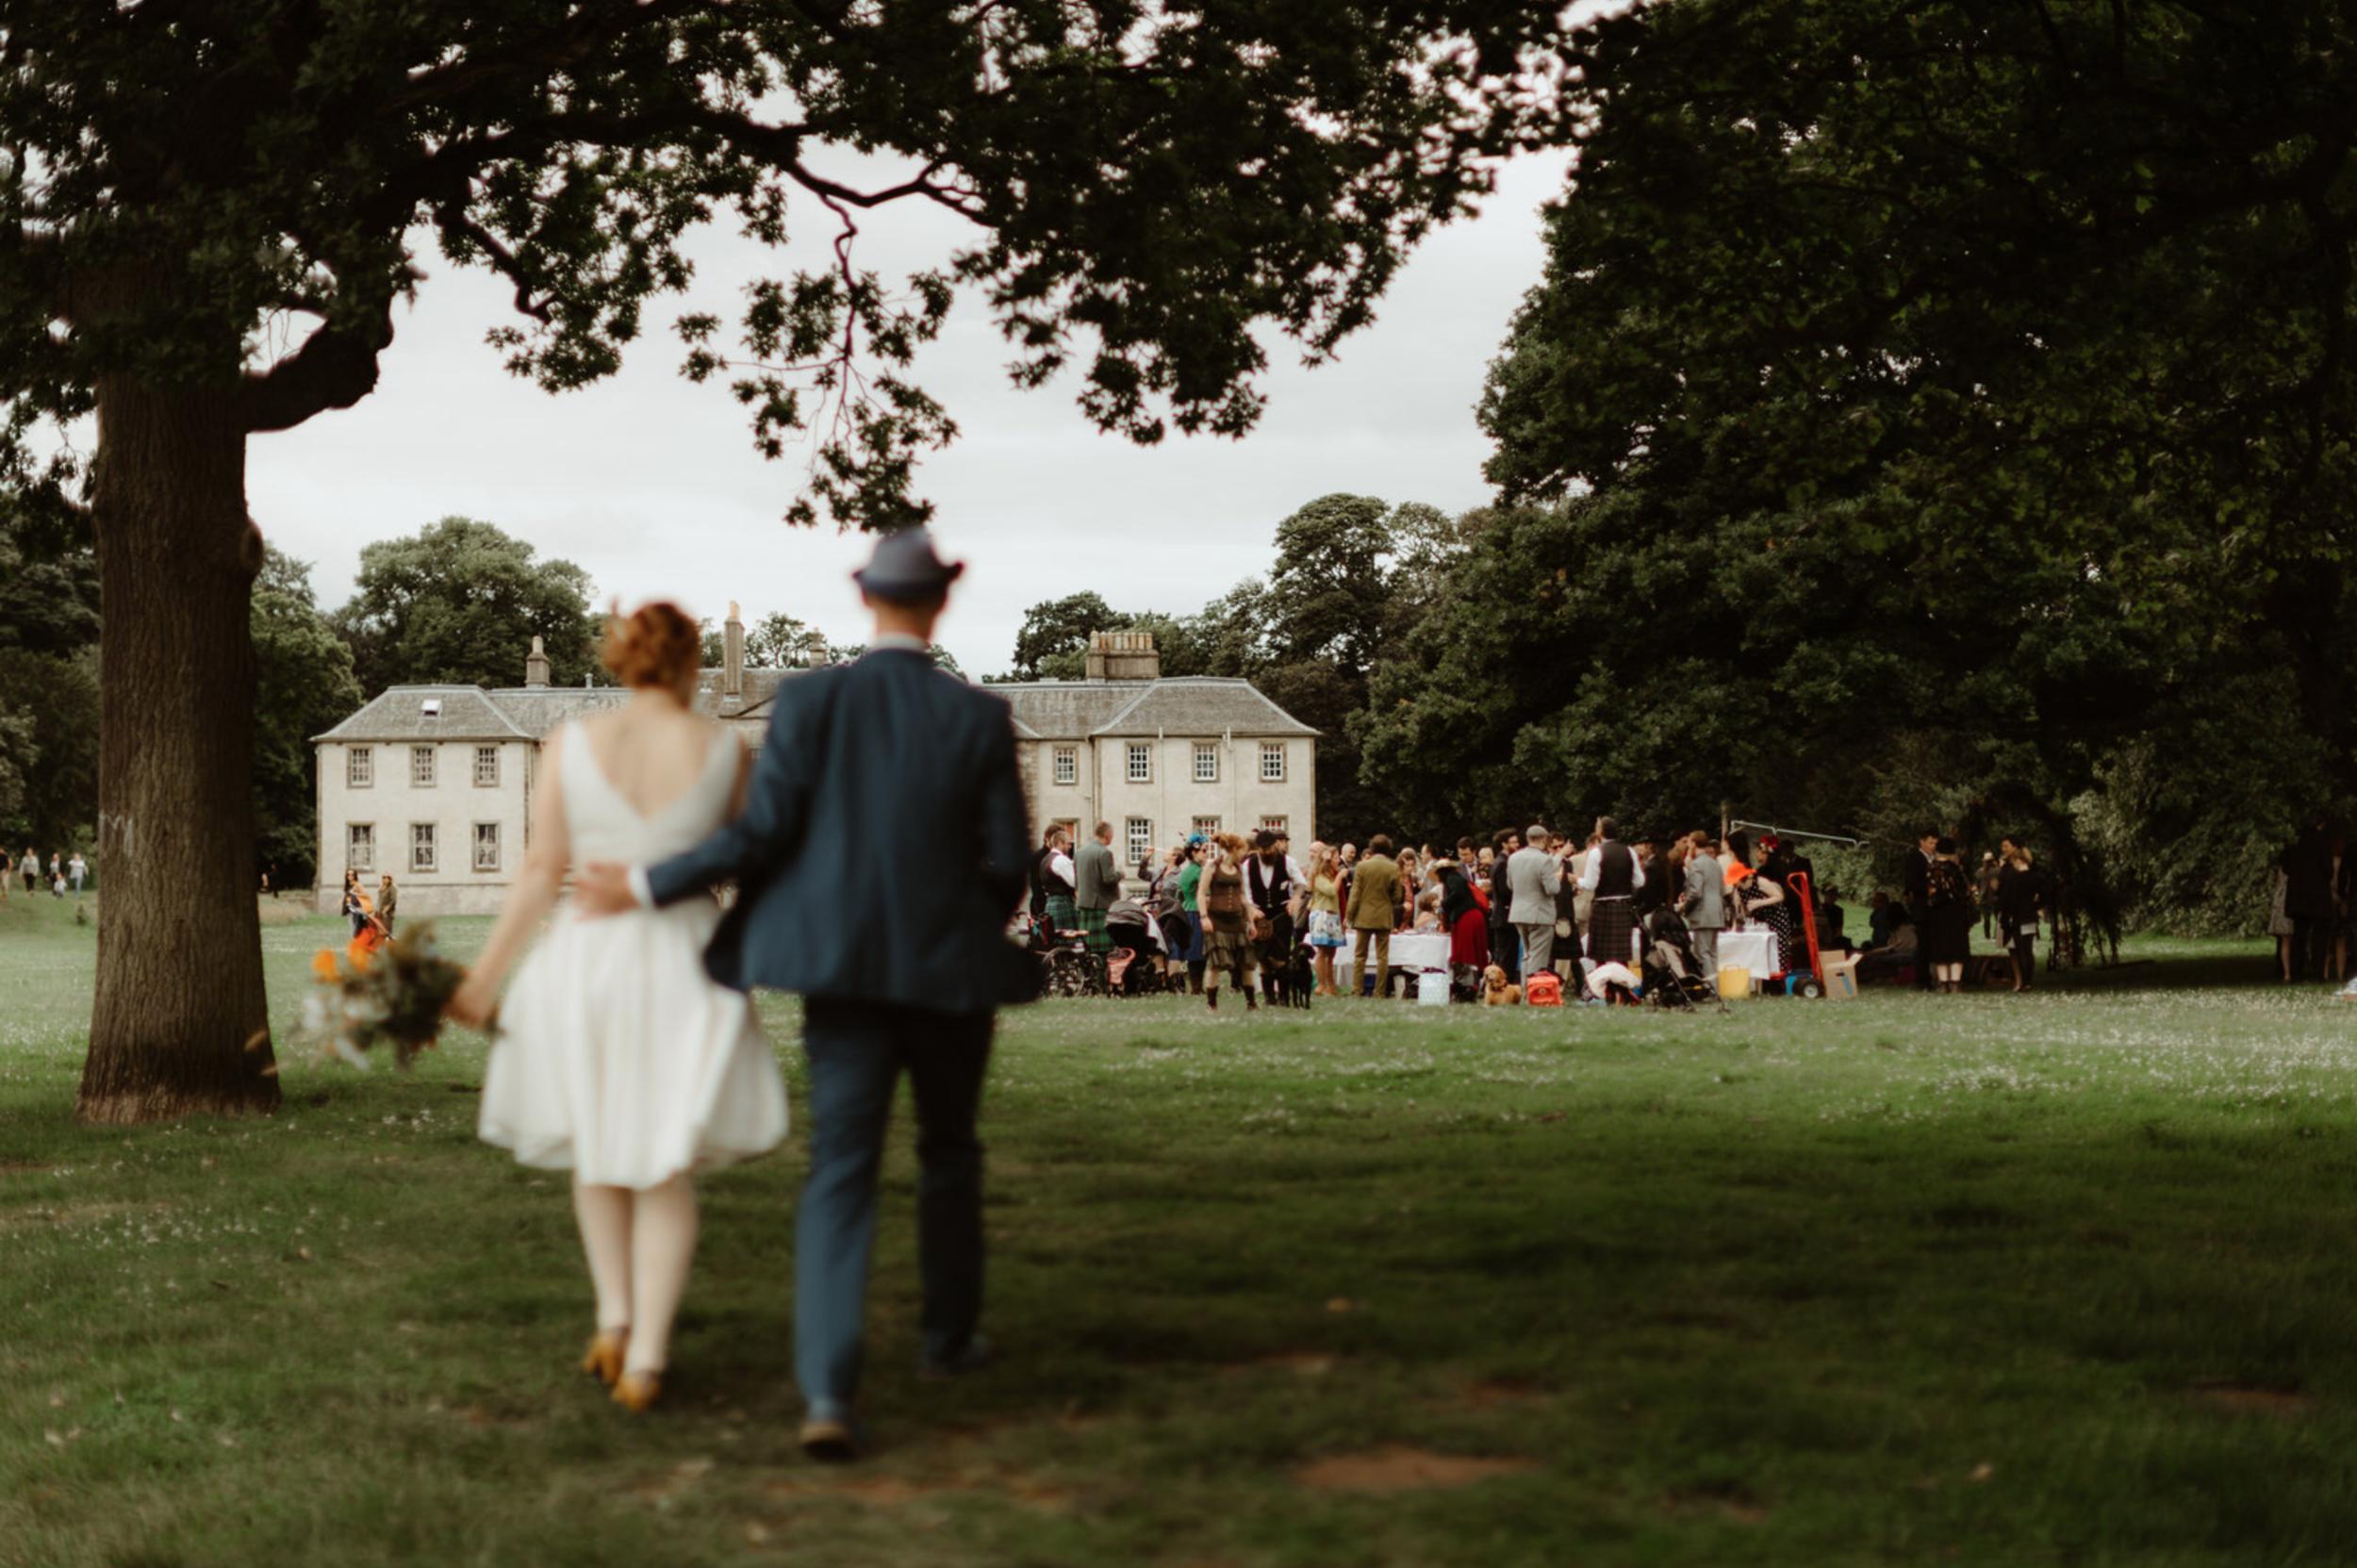 THE BIG BAND CARNIVAL WEDDING - PORTOBELLO